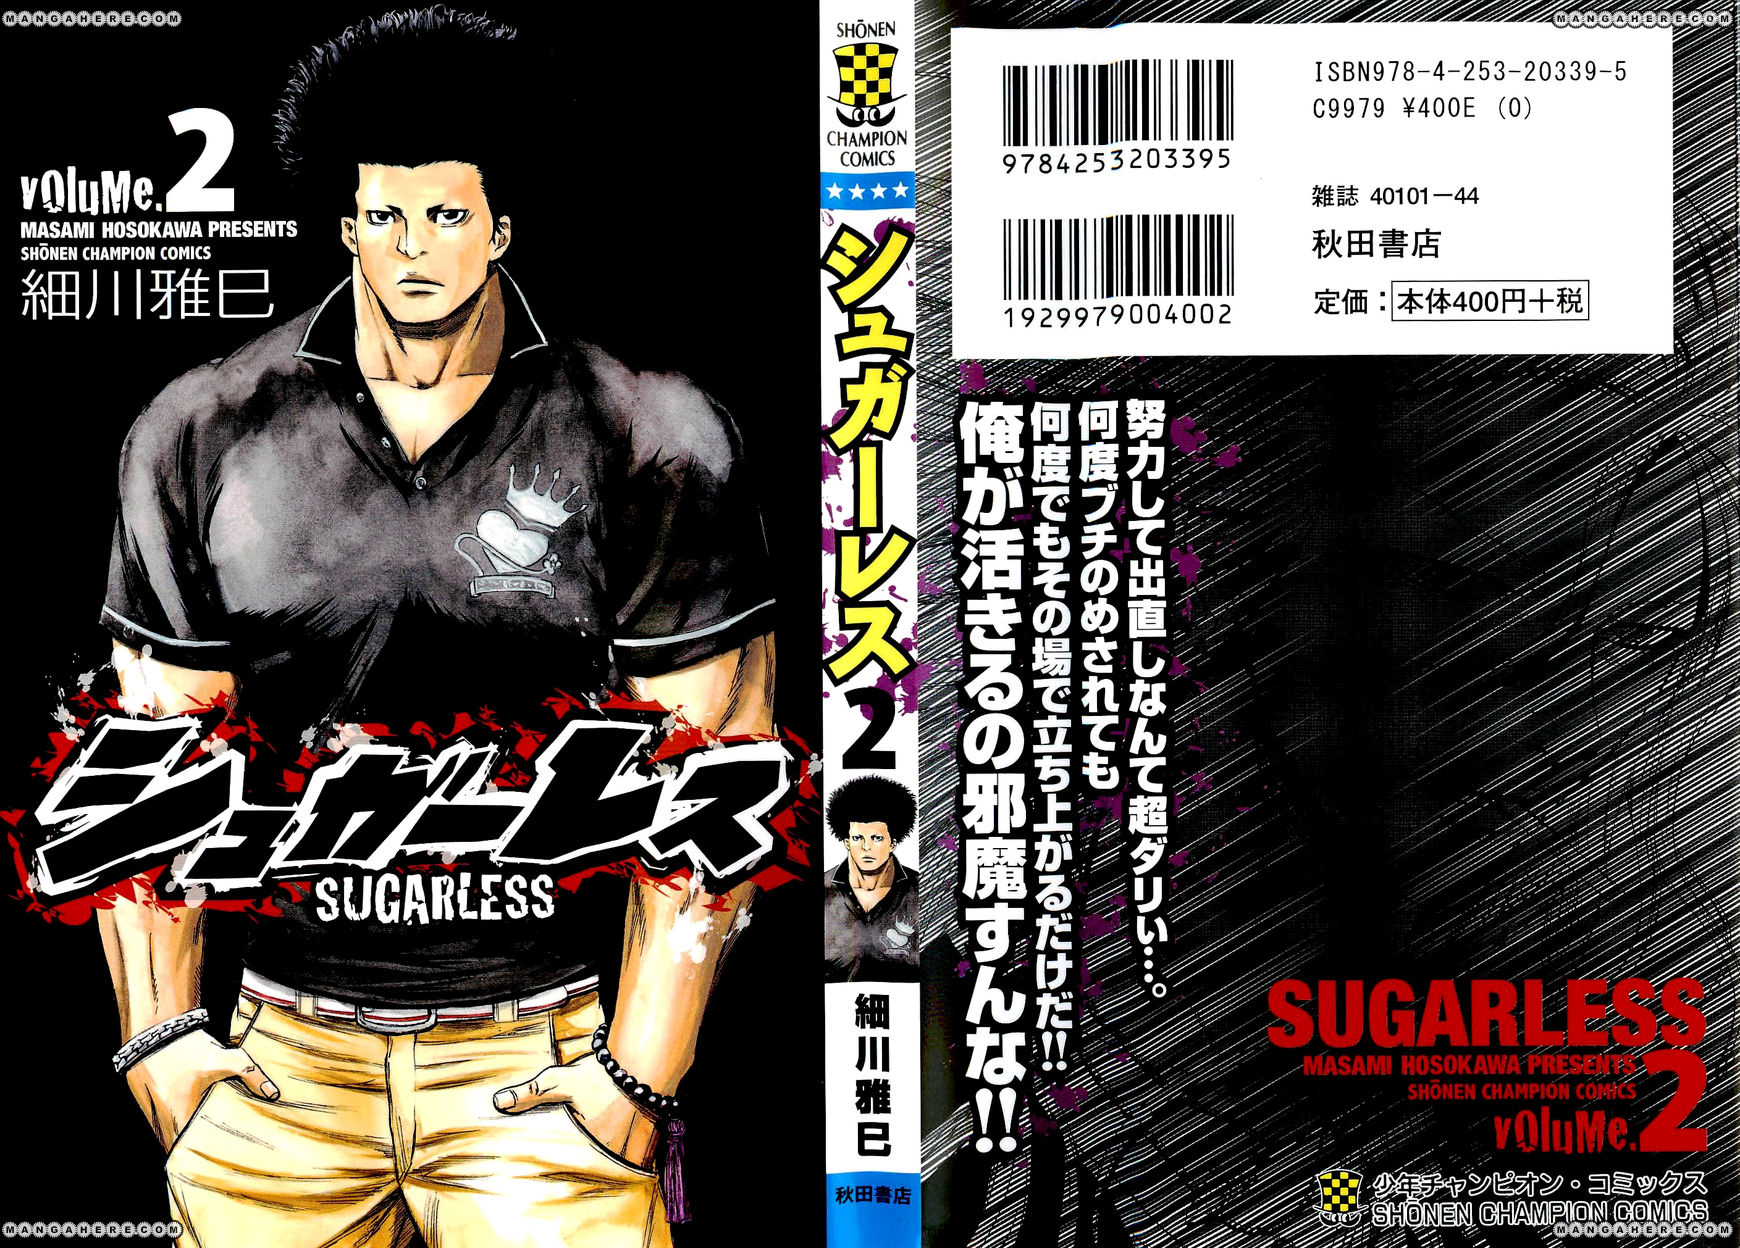 Sugarless (HOSOKAWA Masami) 7 Page 2